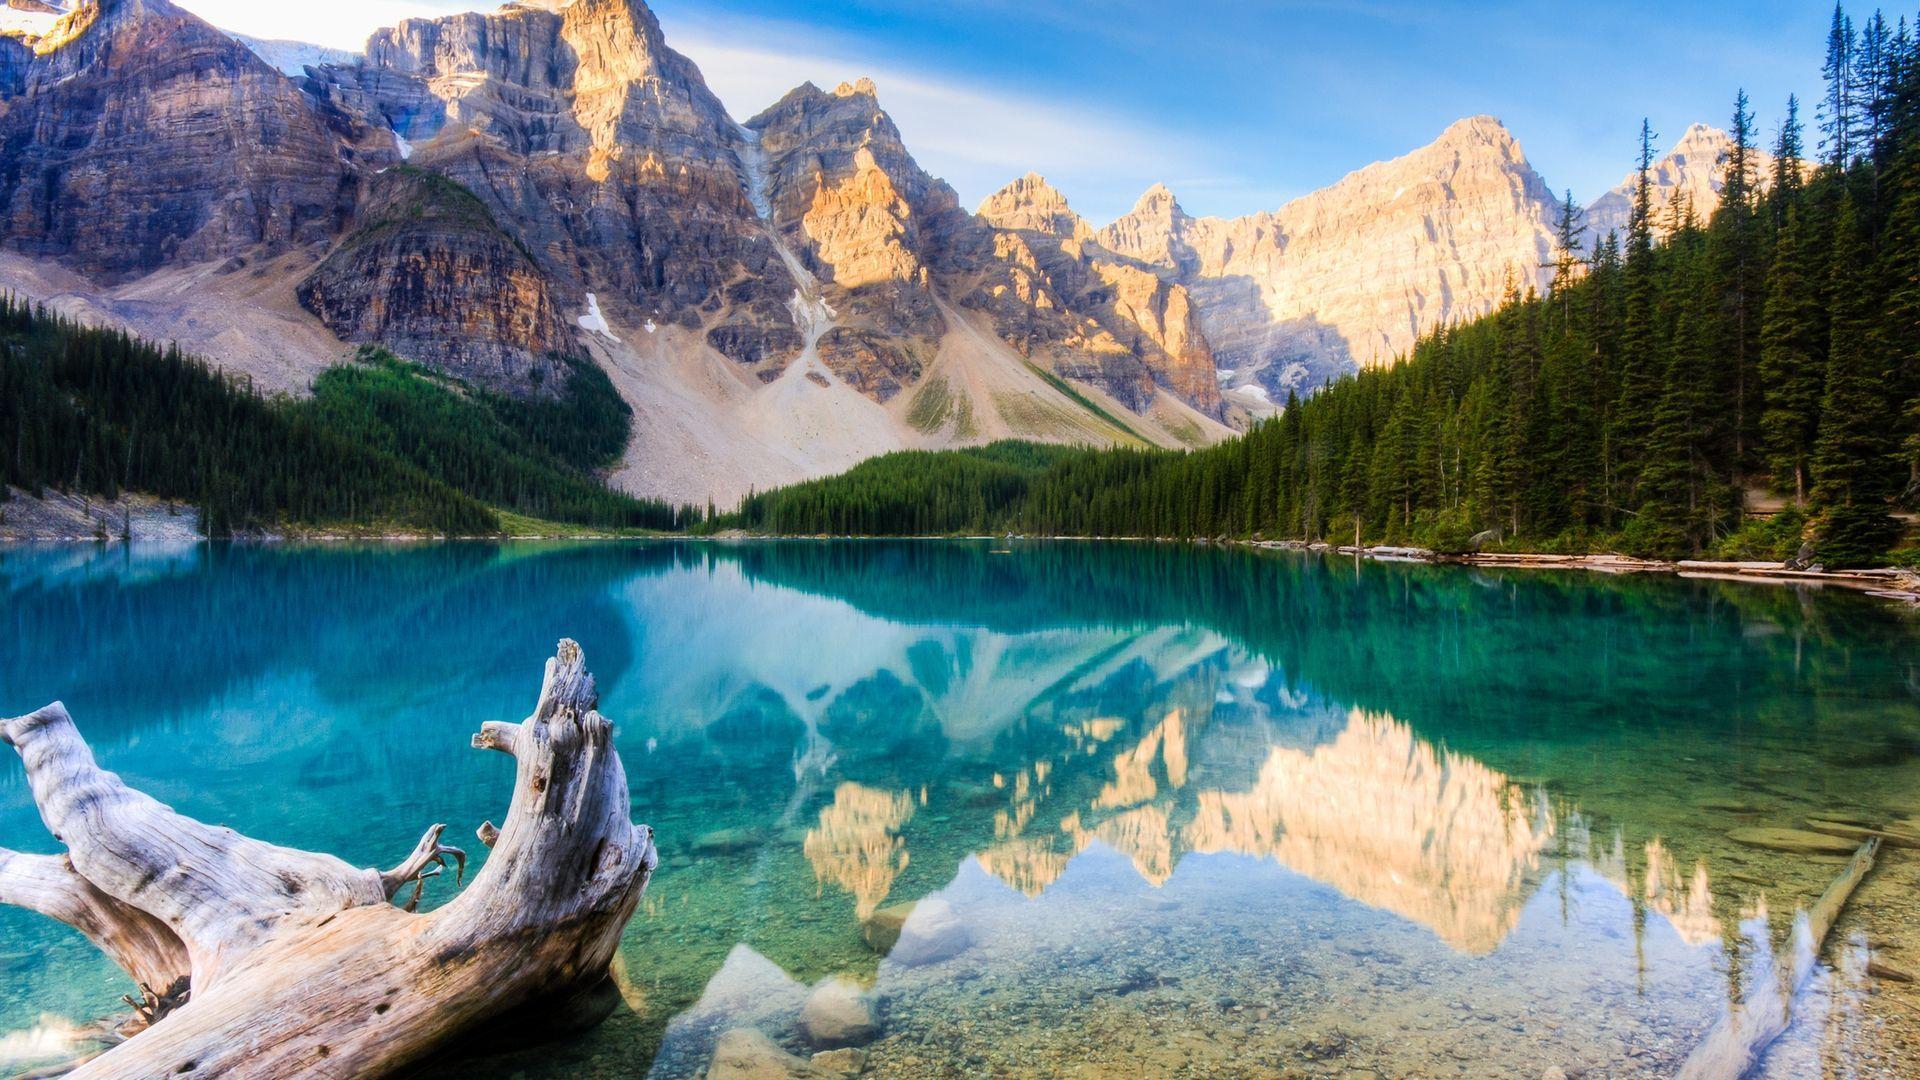 Nature Photo Hd wallpaper 1080p